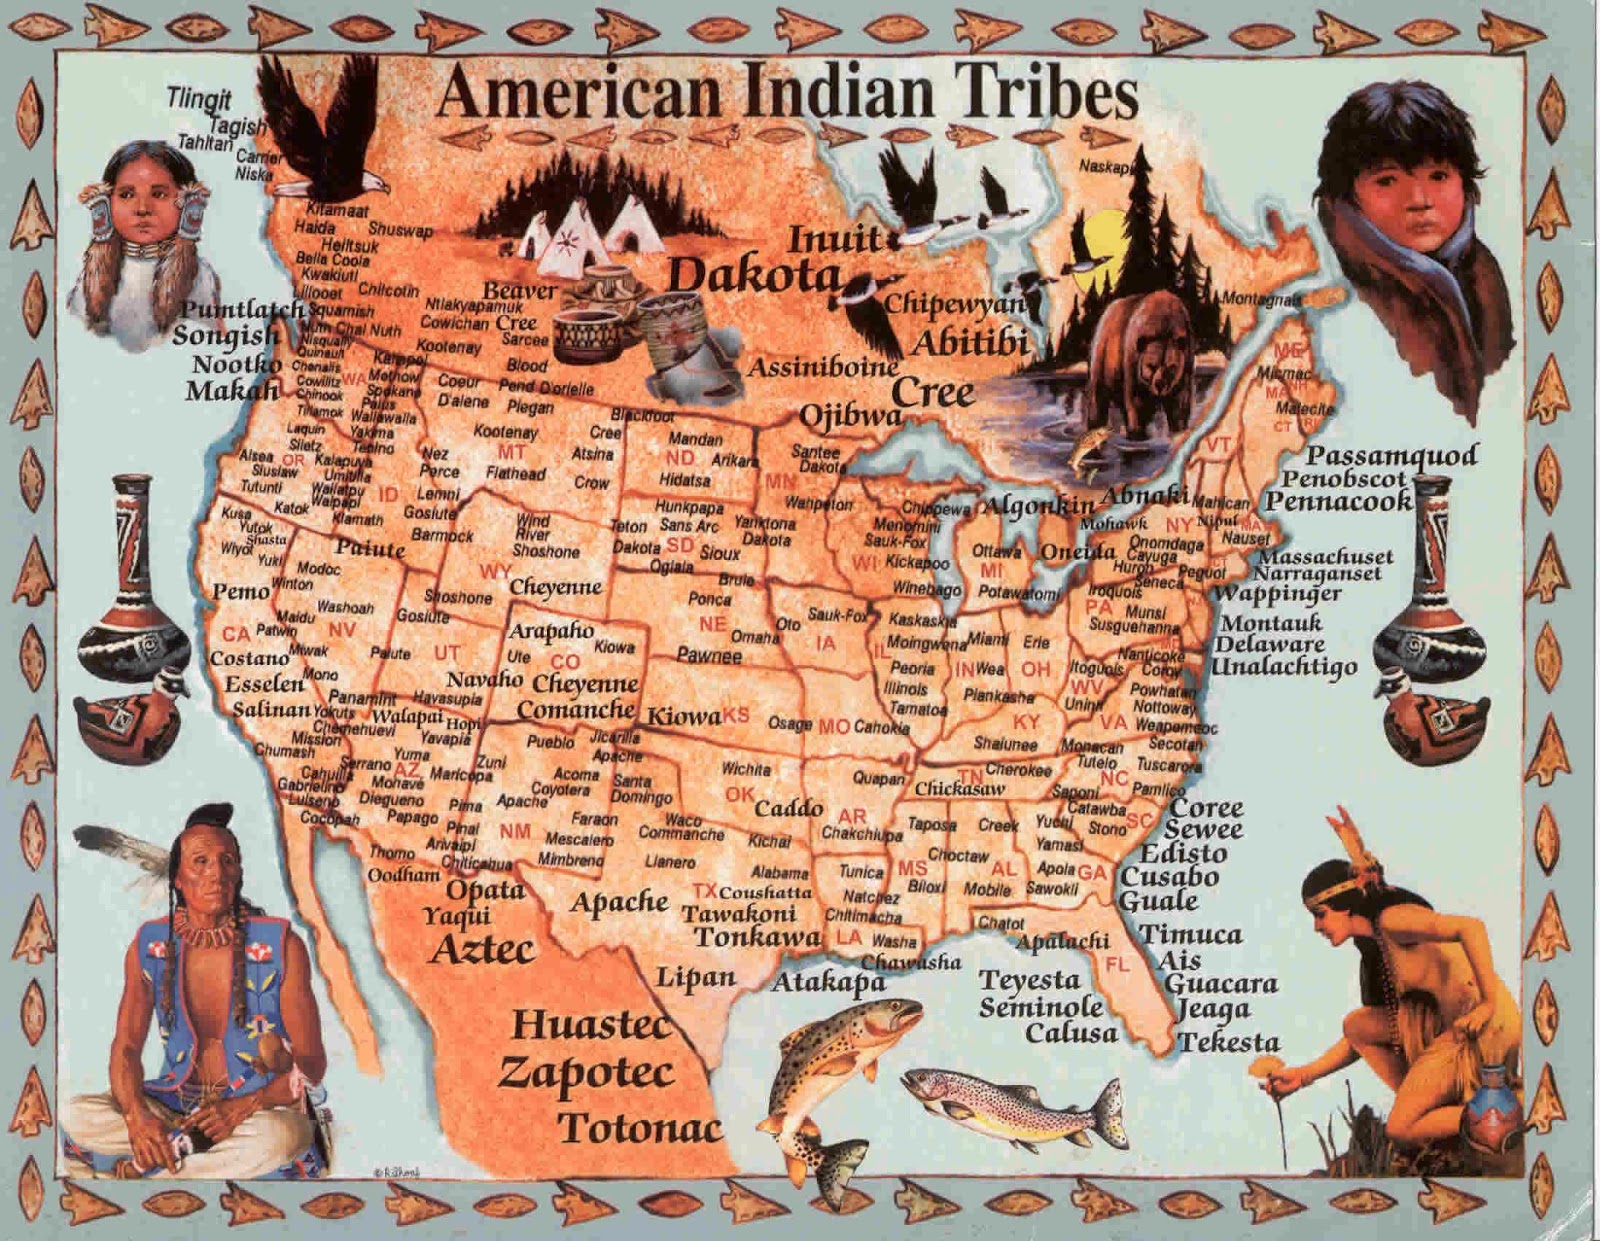 Not native enough